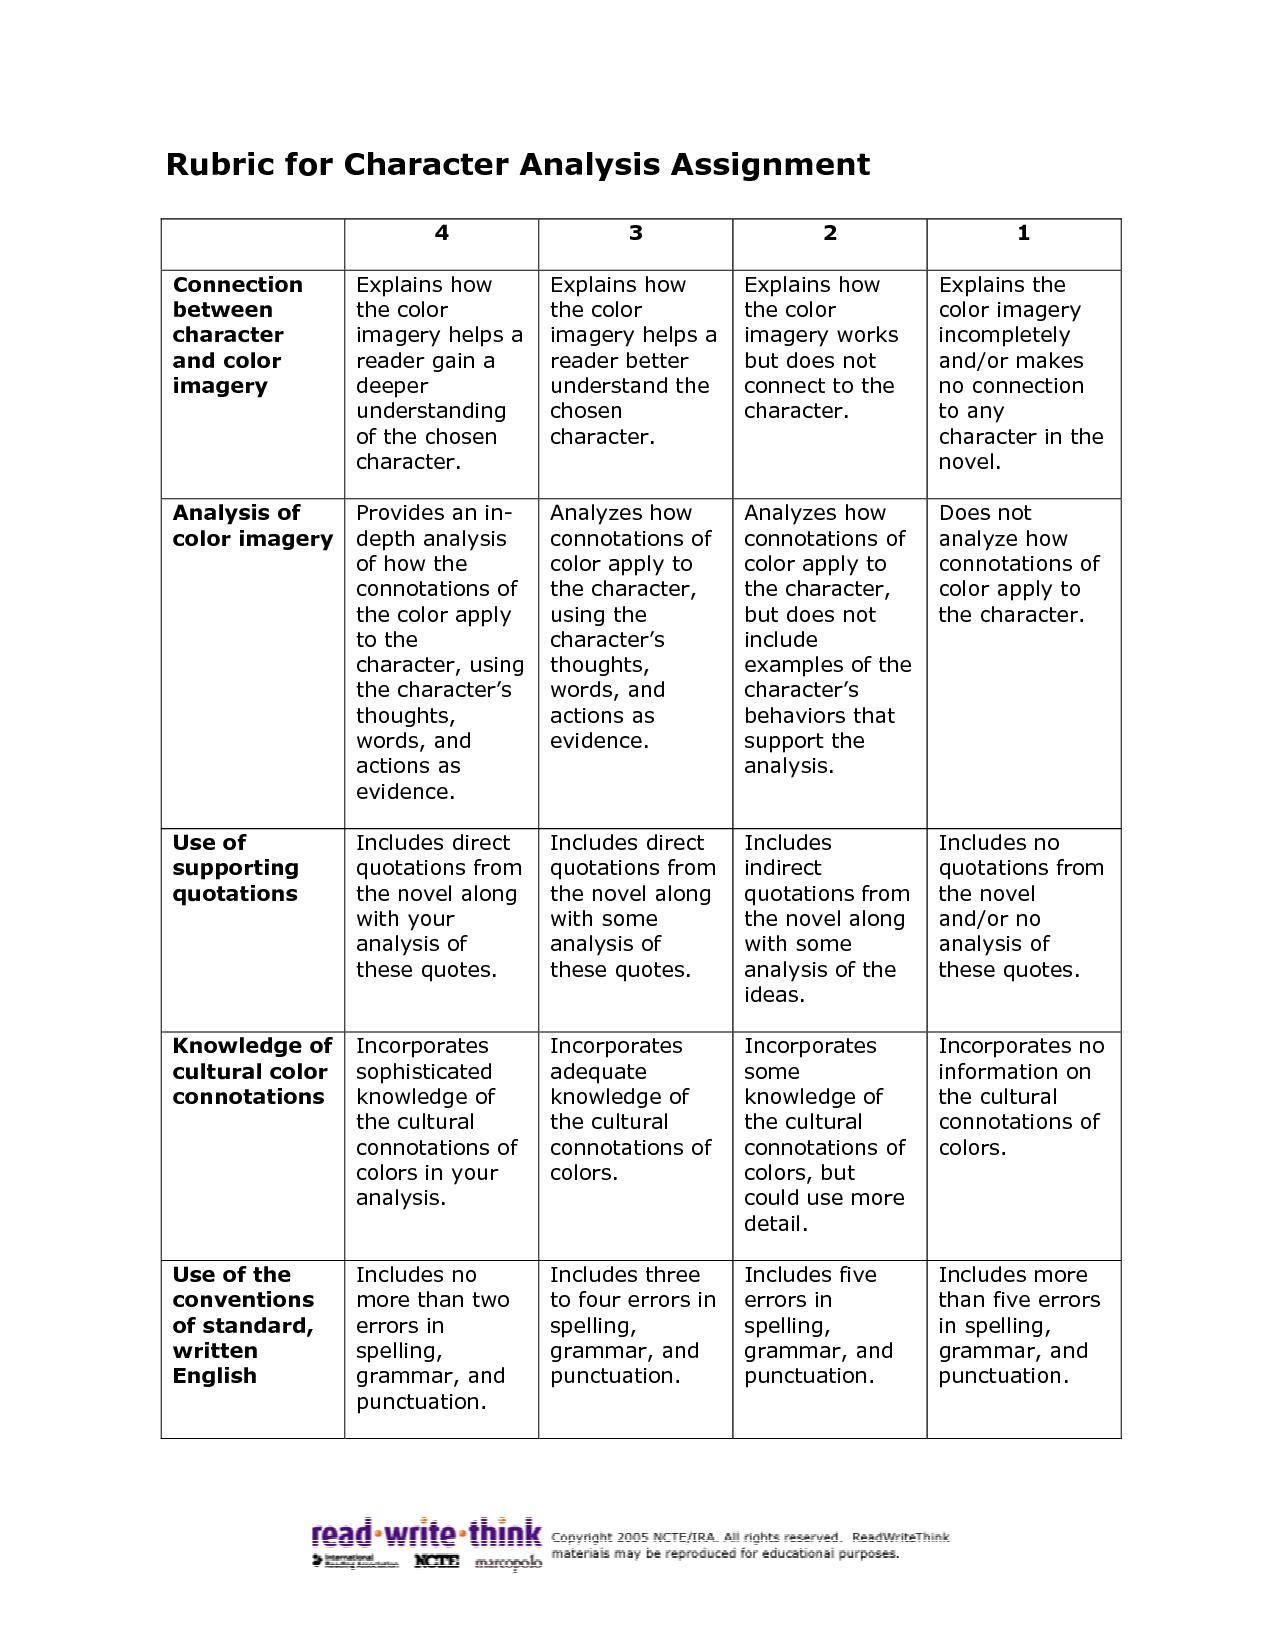 Rubric For Characterysis